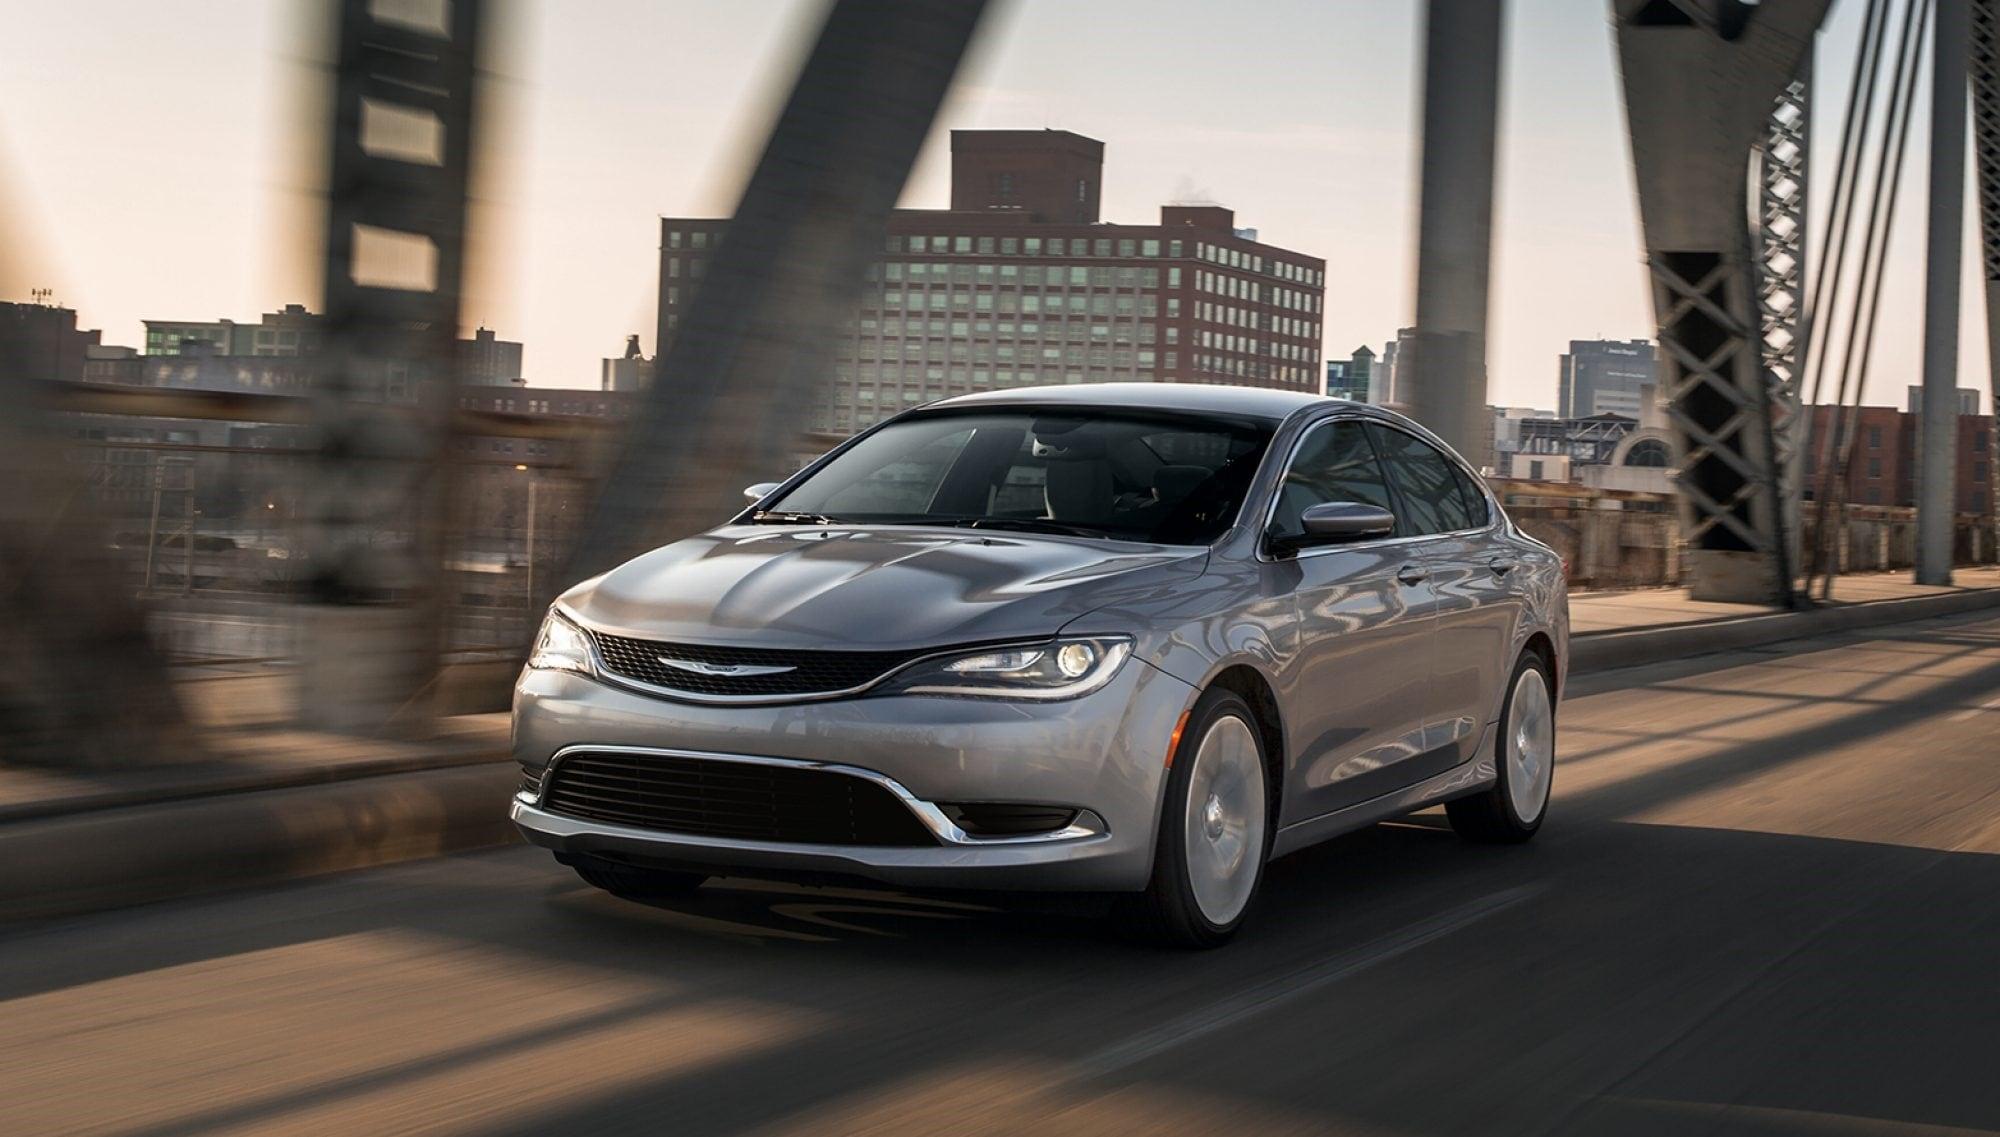 Chrysler 200: Maintaining your vehicle